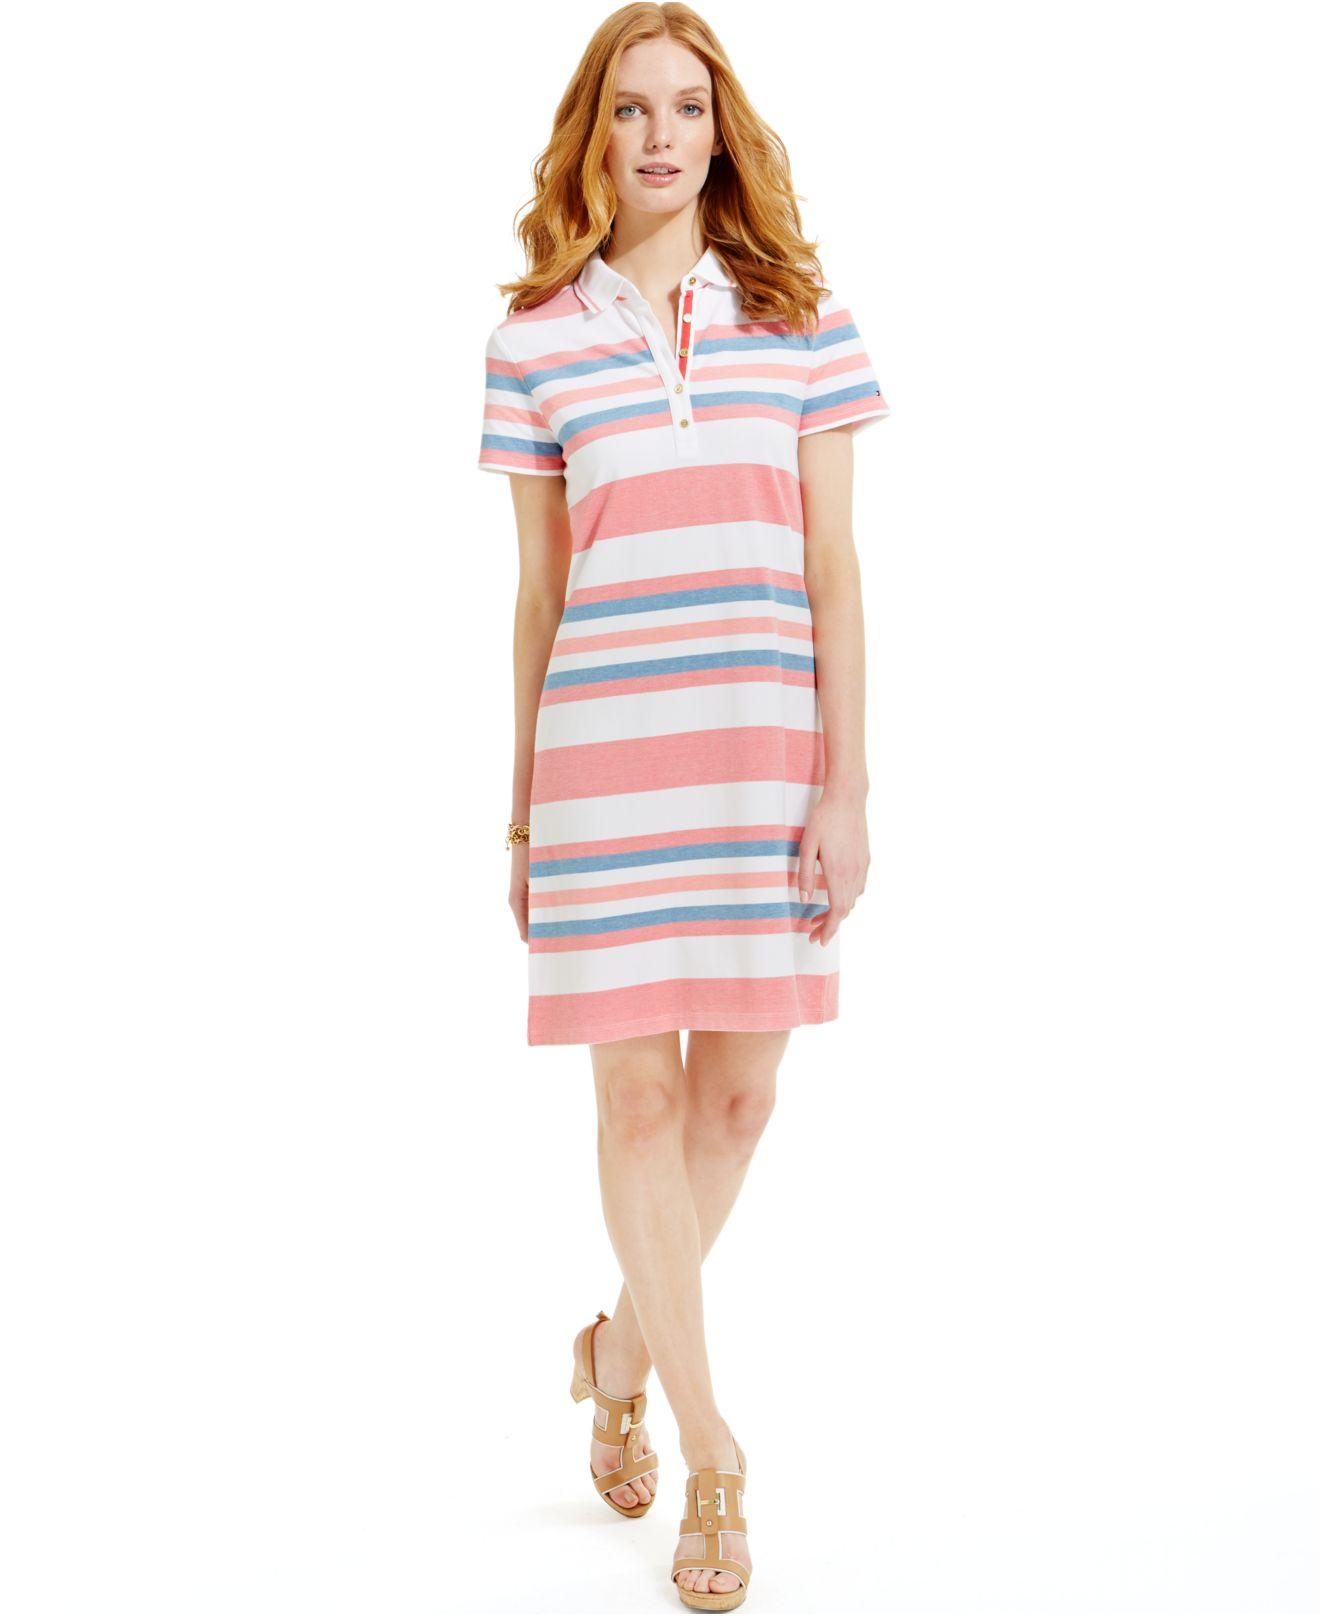 c32ab764 Tommy Hilfiger Striped Polo Shirt Dress - Lyst